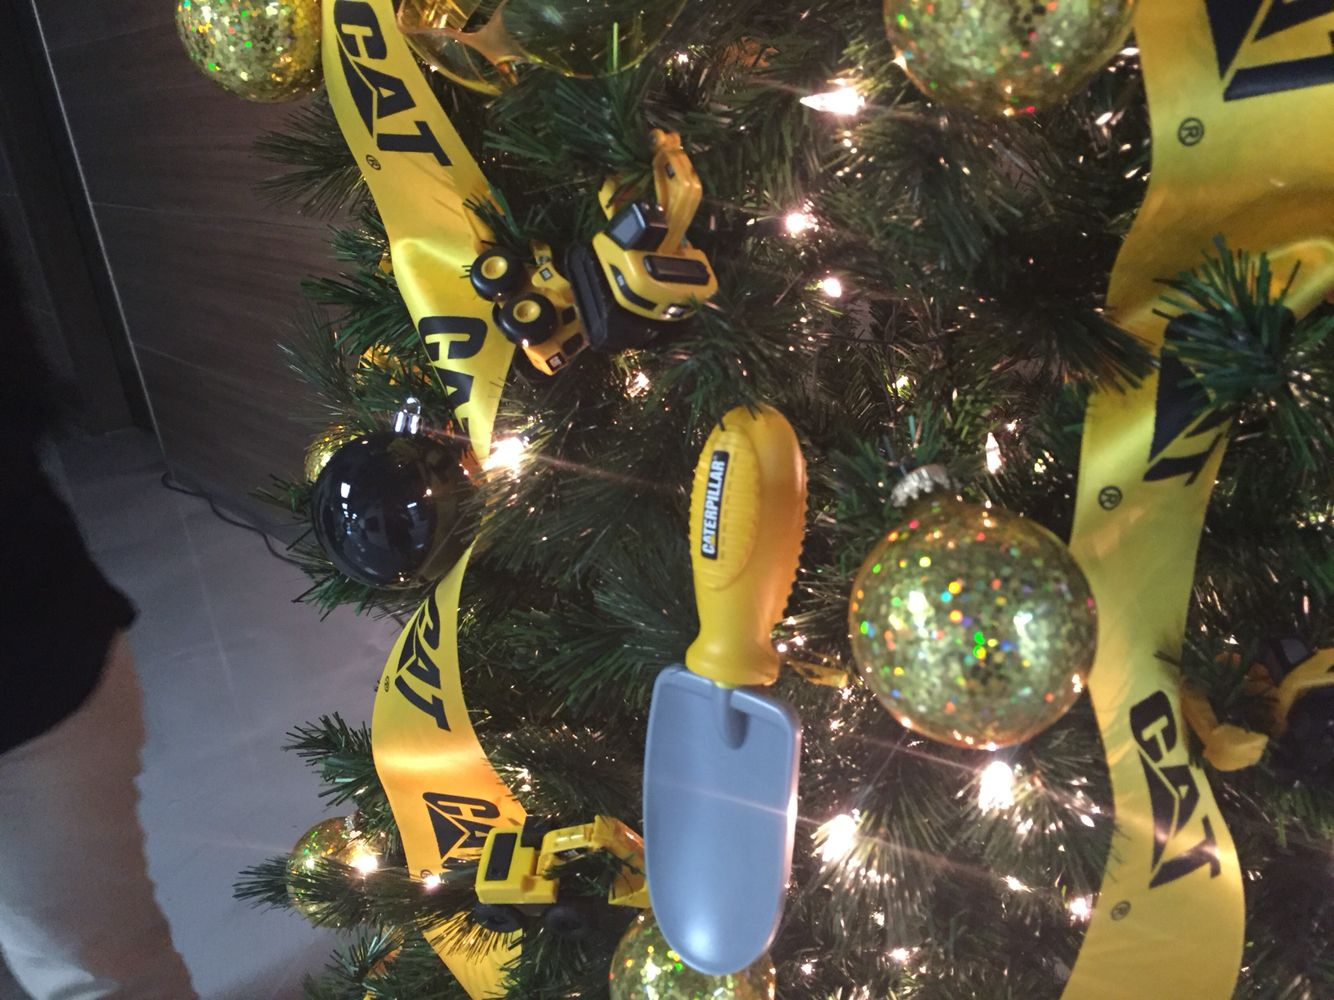 Construction Themed Christmas Tree At Caterpillar Nlr Christmas Tree Themes Christmas Tree Ornaments Holiday Christmas Tree